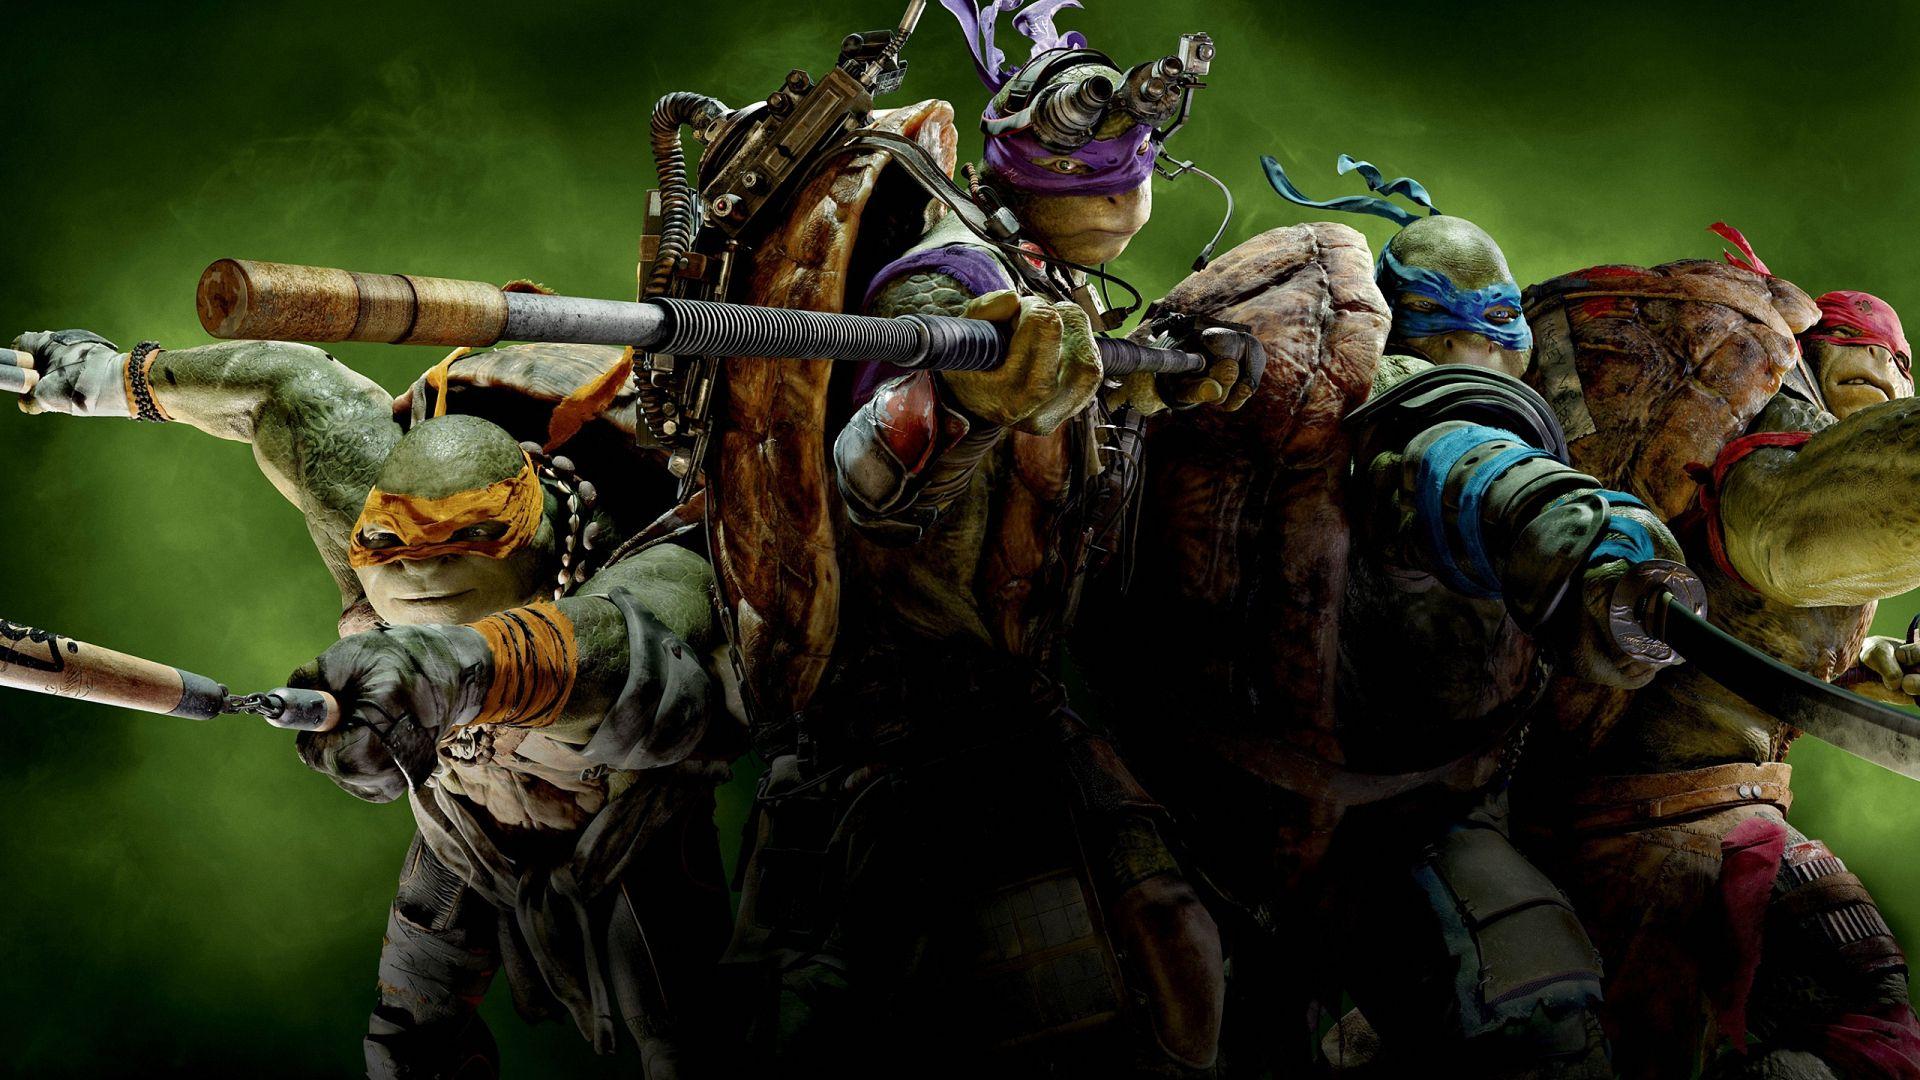 1920x1080 Teenage Mutant Ninja Turtle Movies Hd Wallpapers 1080p